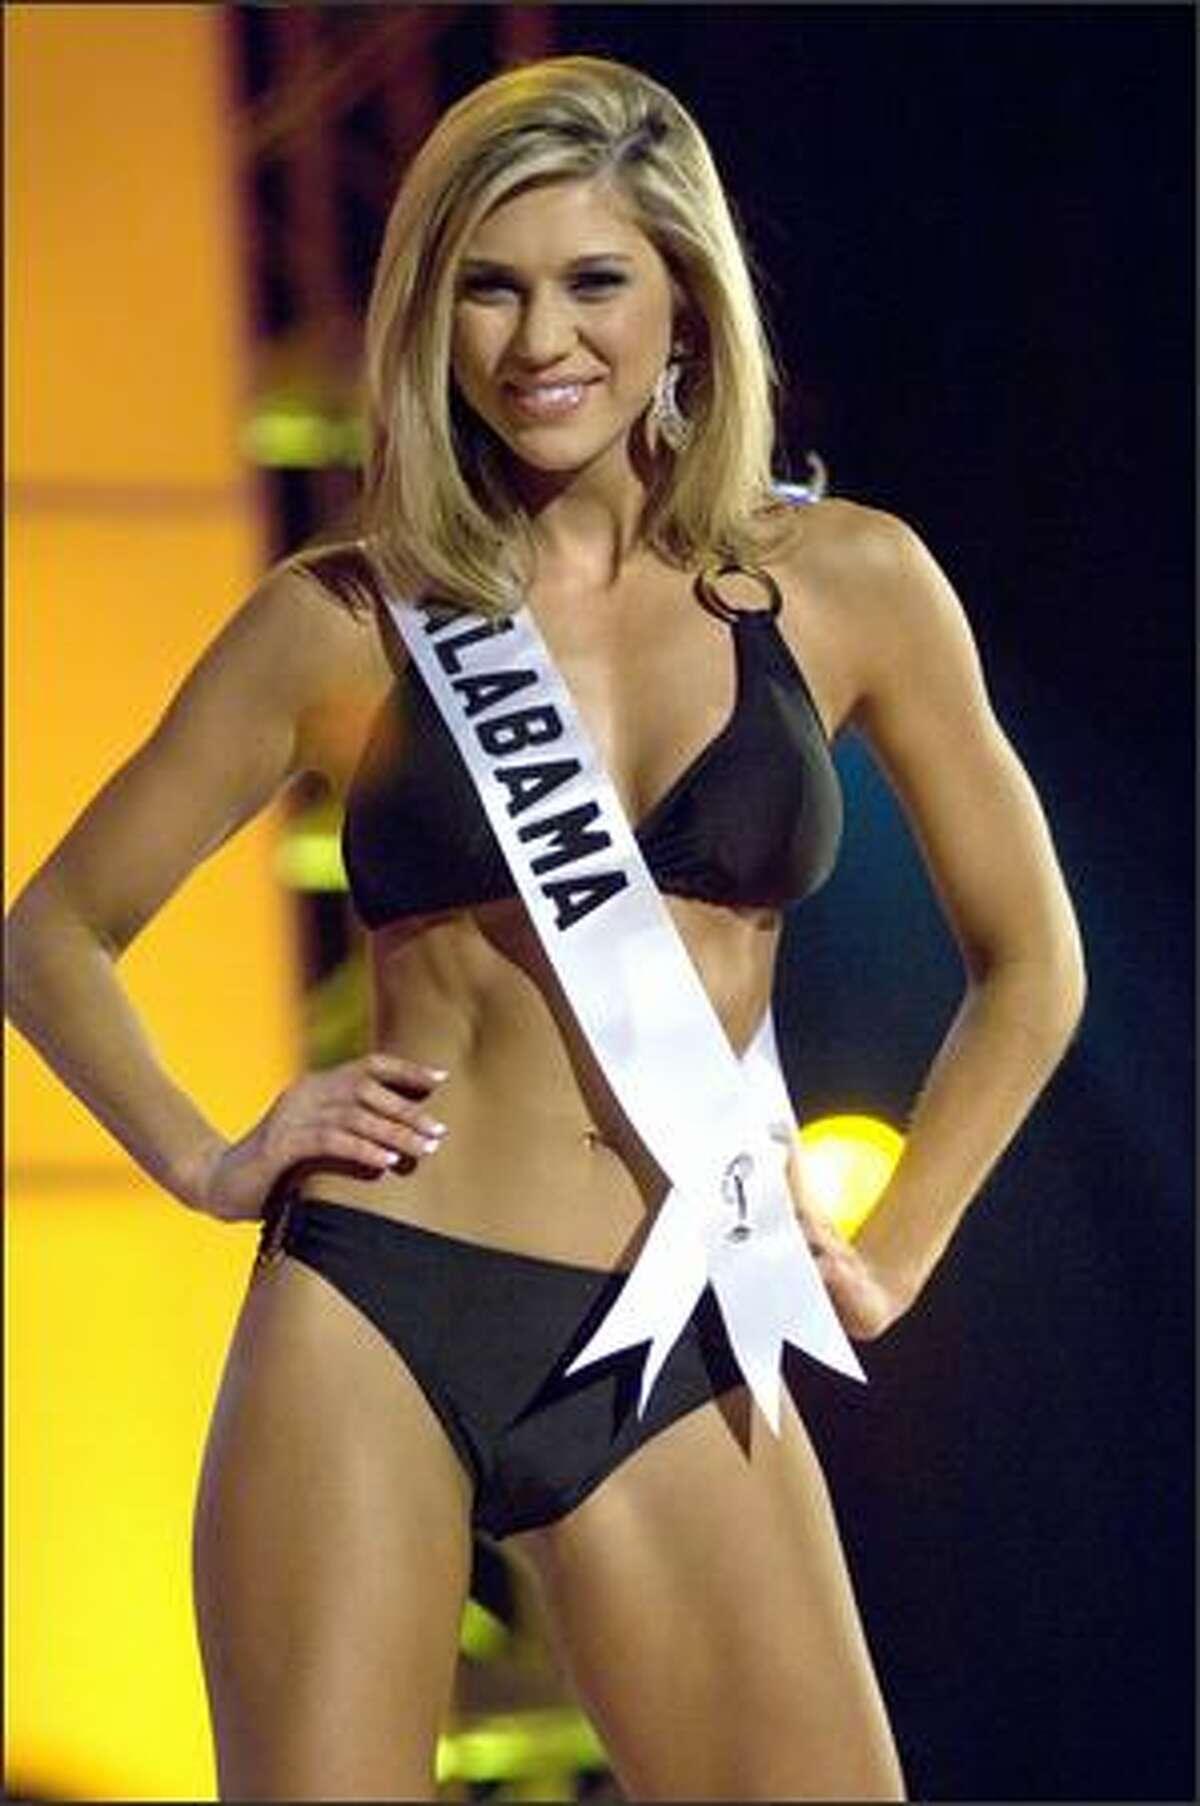 Keisha Walding, Miss Alabama USA 2008.